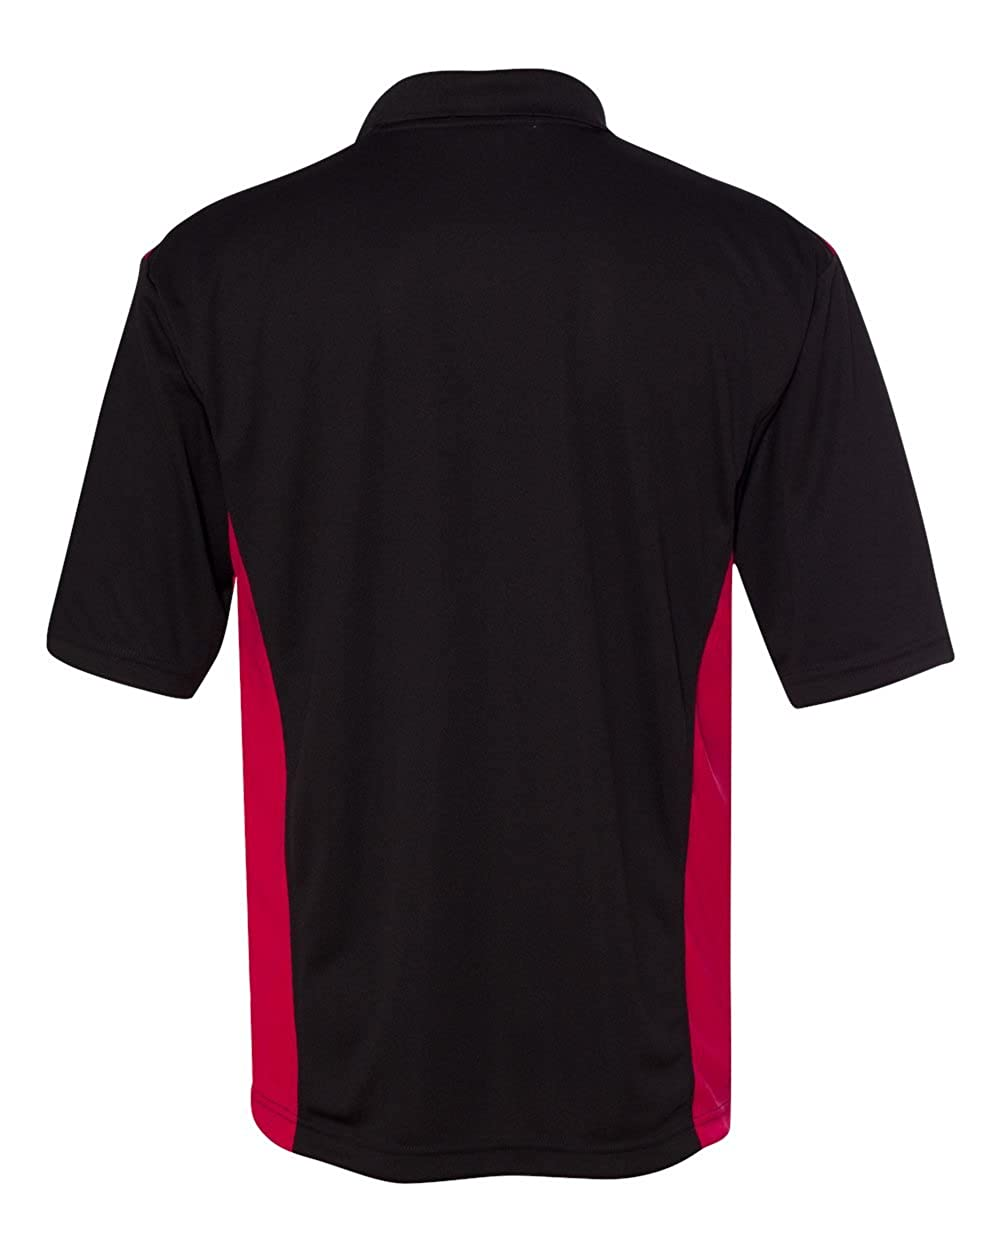 FeatherLite Mens 0466 Spirit Racing Colorblocked Moisture-Free Mesh Short Sleeve Sport Polo Shirt